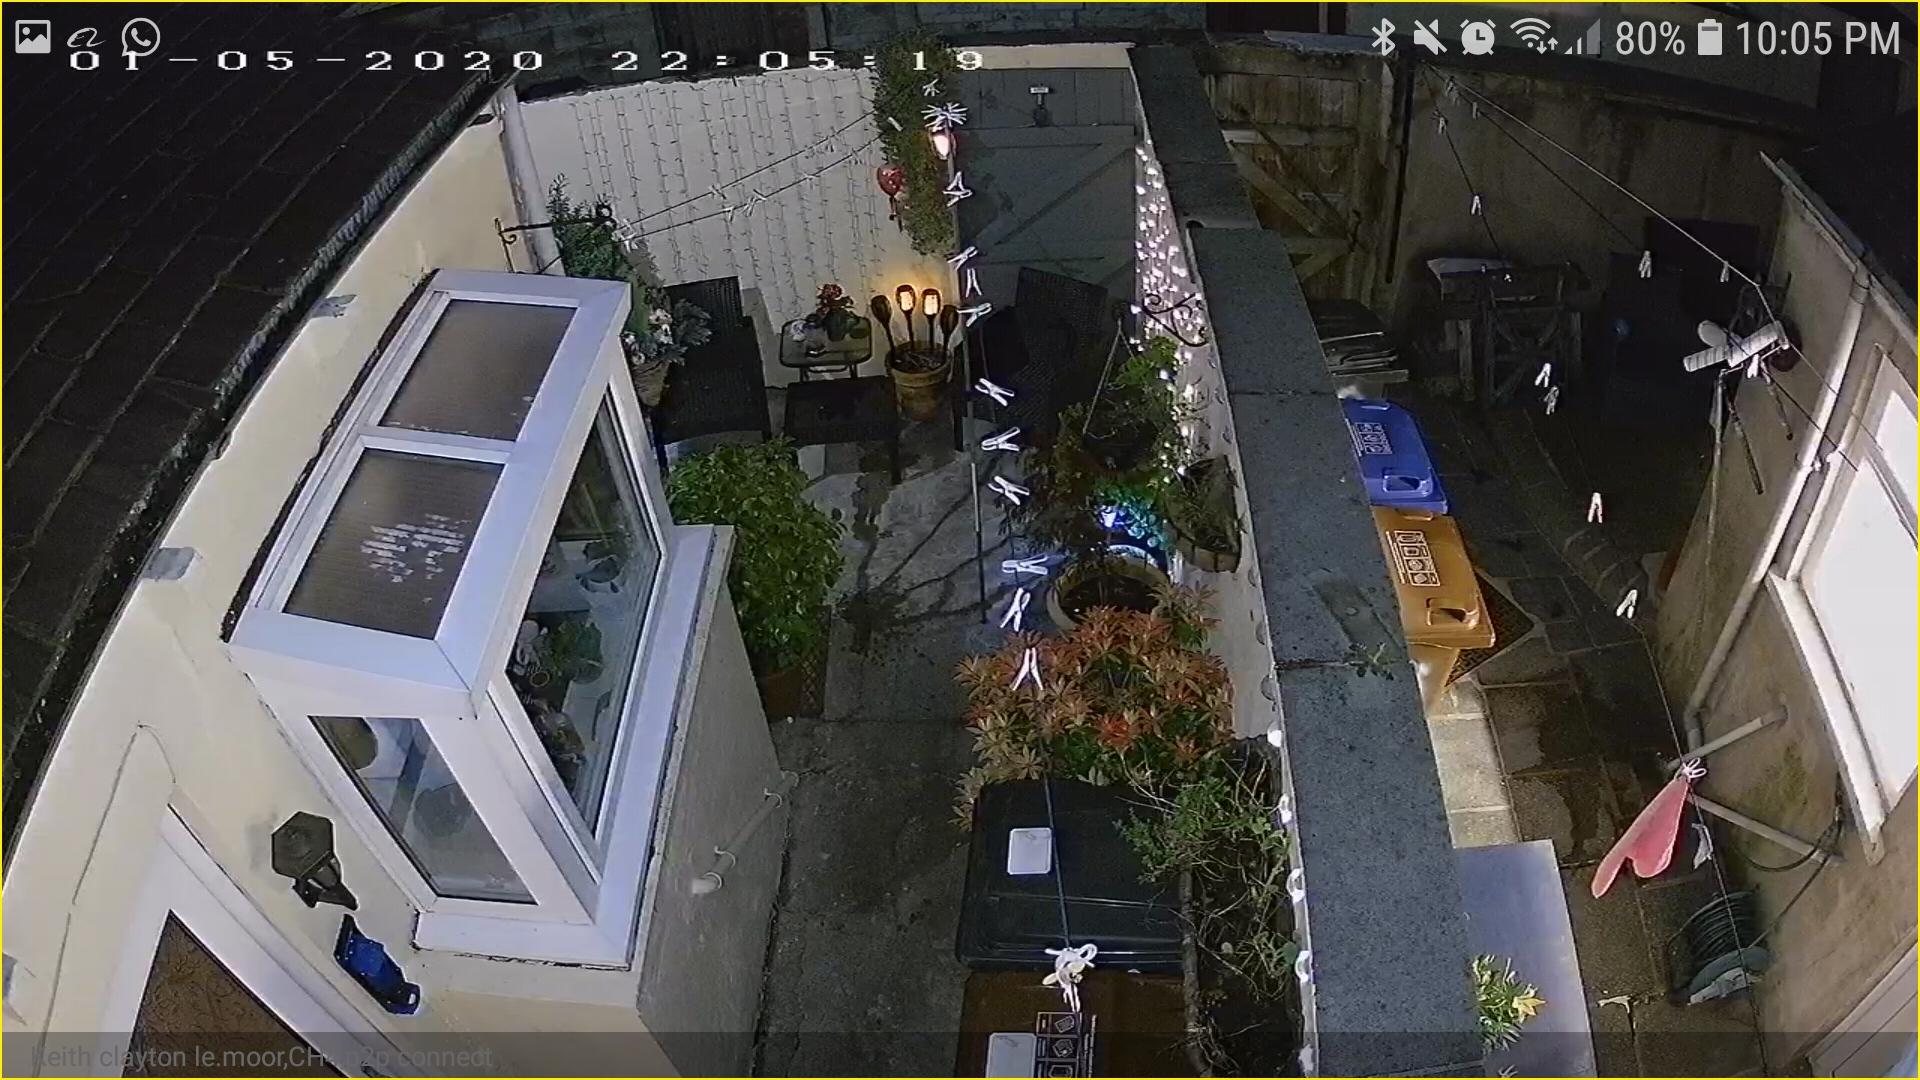 https://0201.nccdn.net/4_2/000/000/017/e75/screenshot_20200501-220523_bitvision.jpg